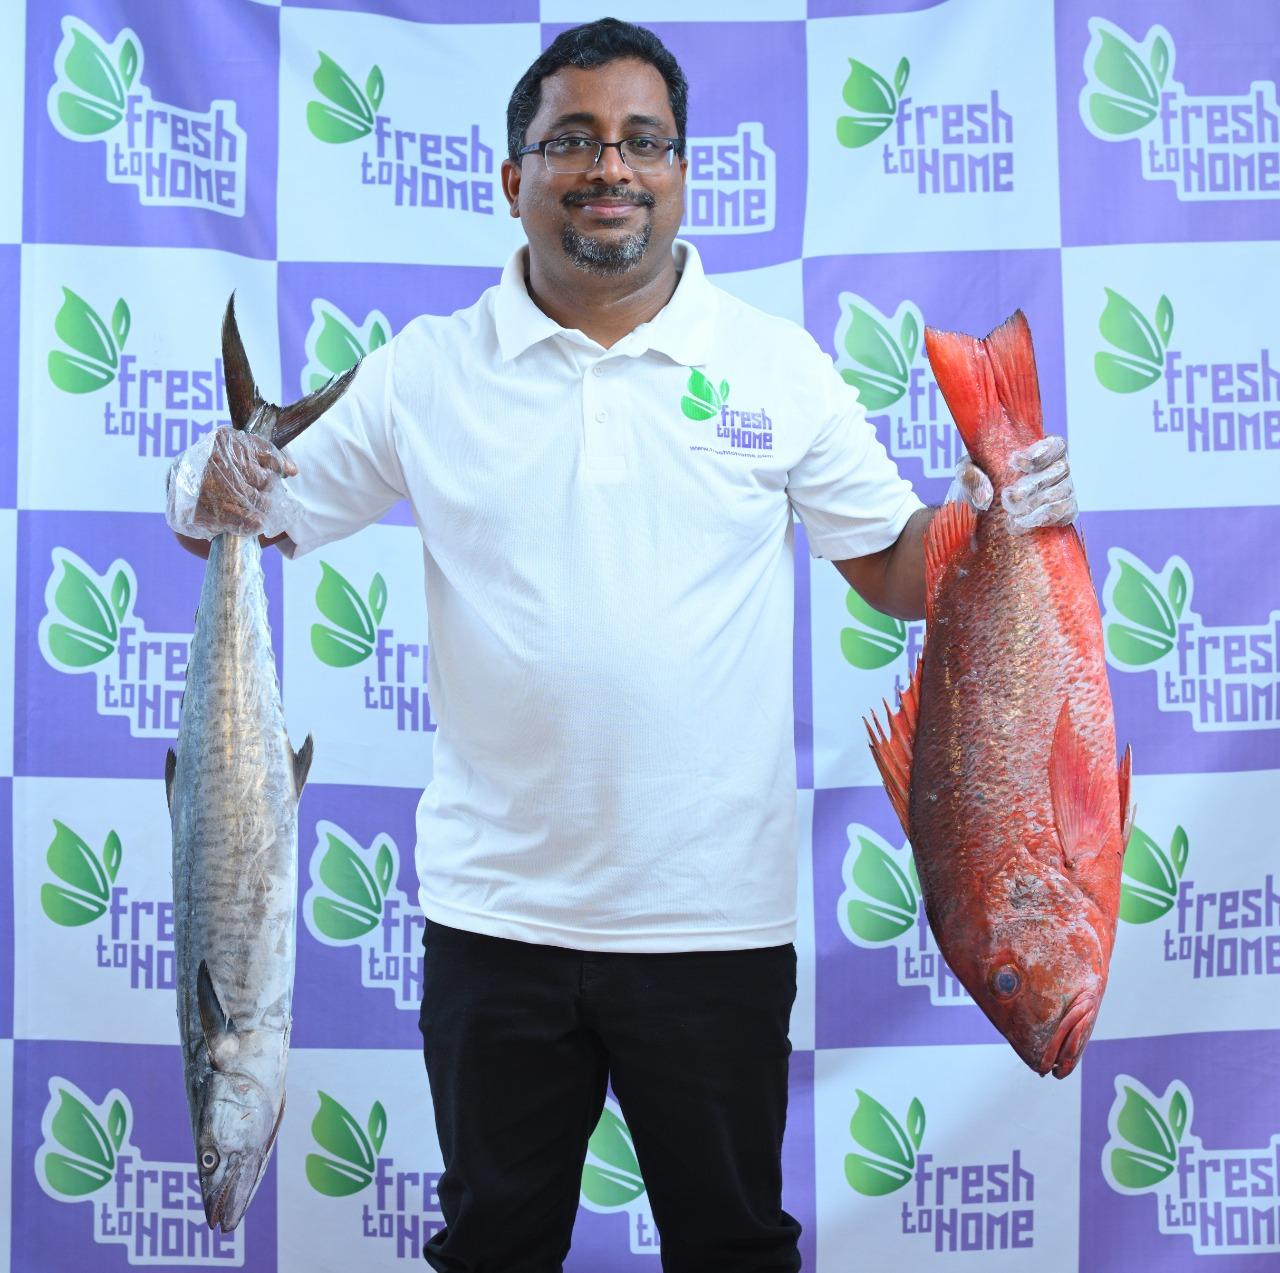 Shan-Kadavil-Co-Founder-and-CEO-of-FreshToHome_2.jpg